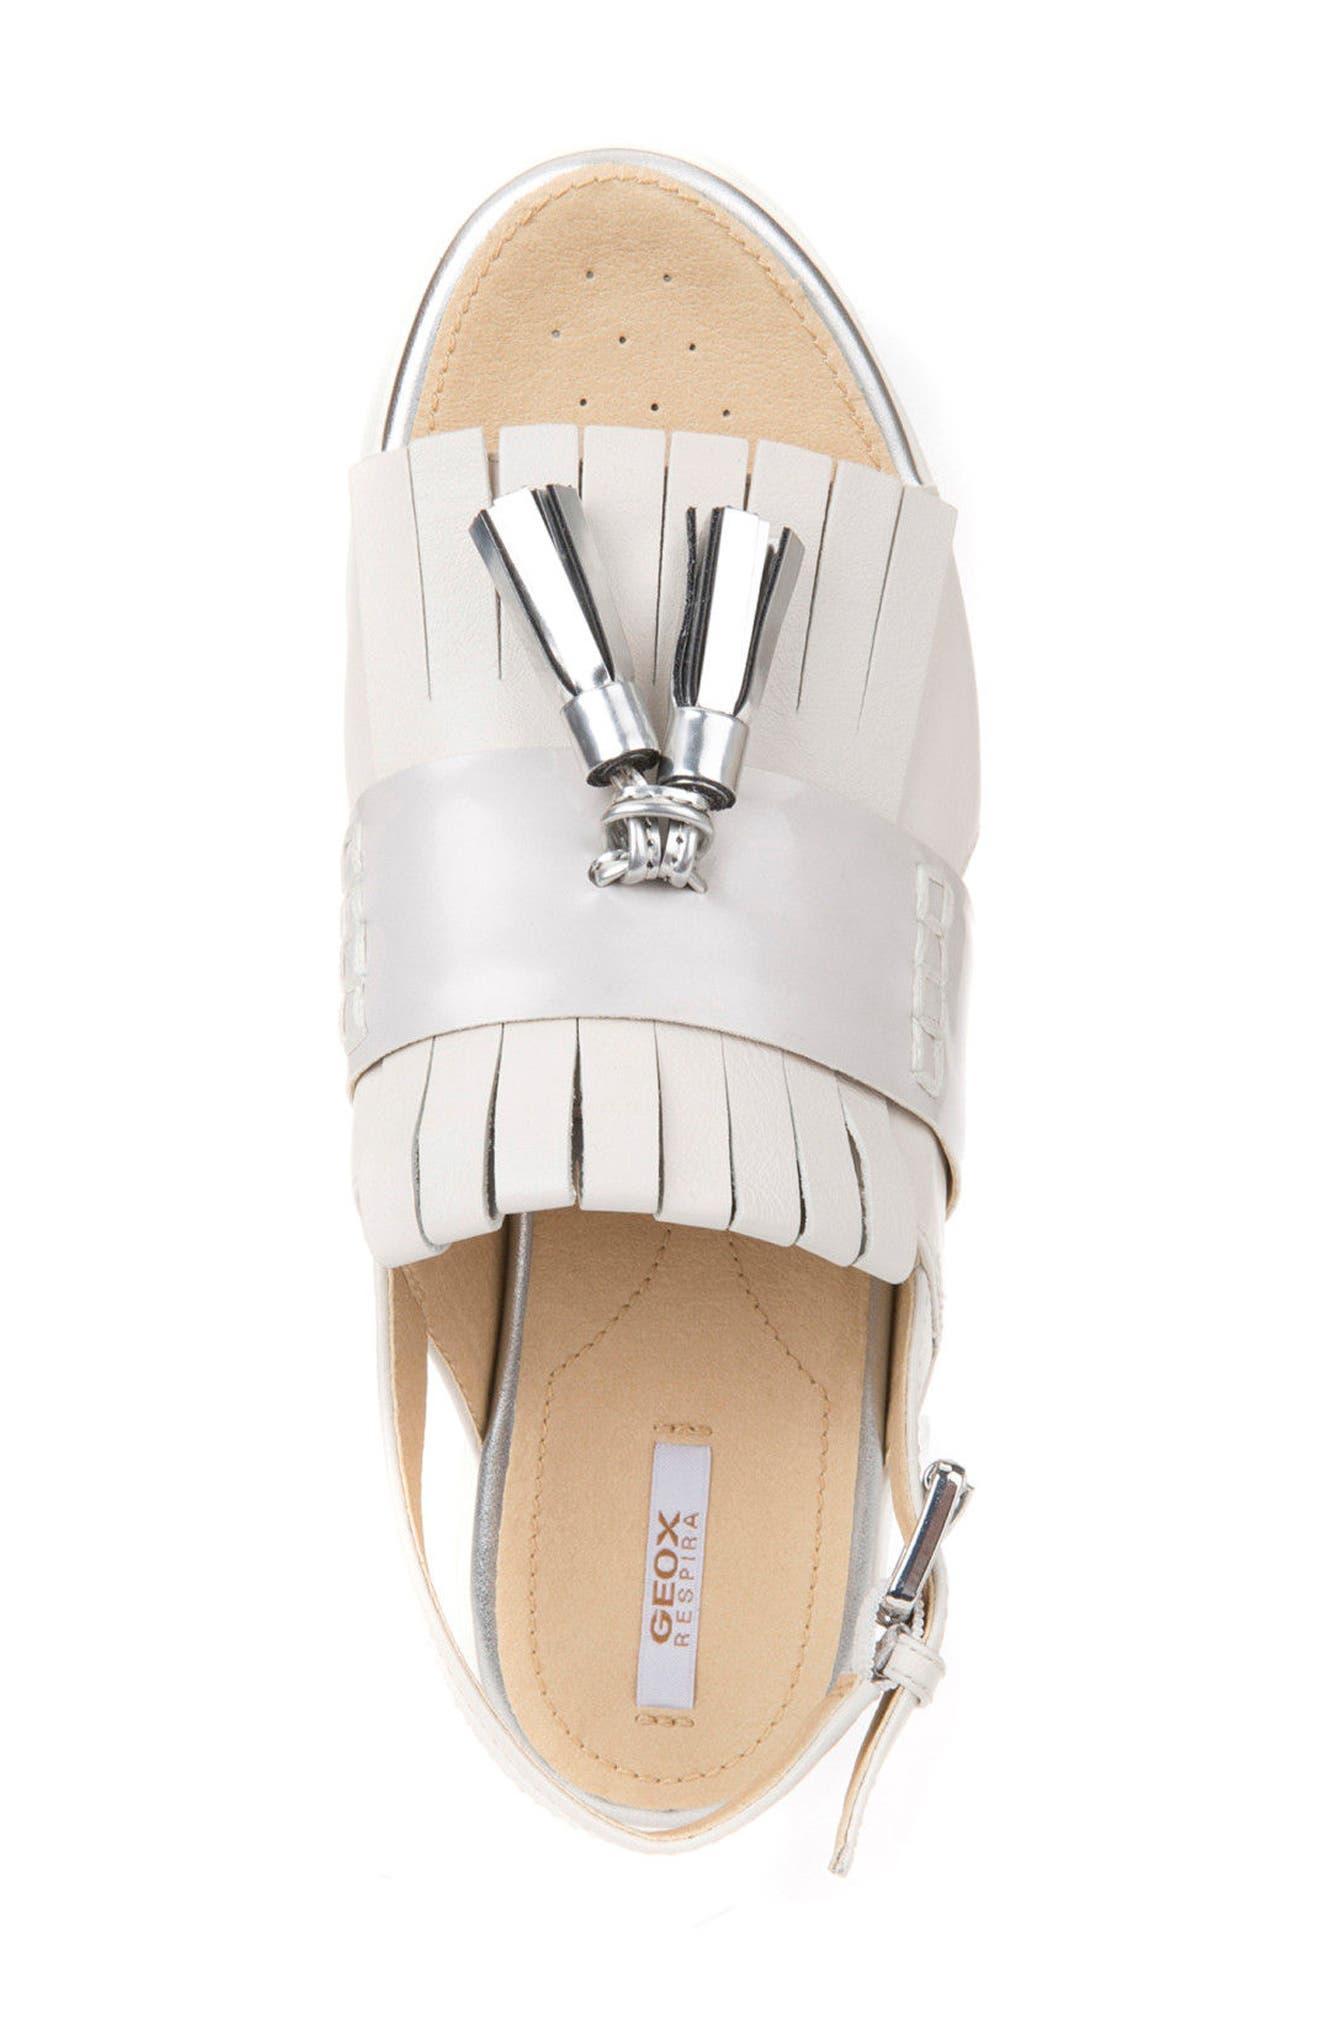 Amalitha Platform Sandal,                             Alternate thumbnail 4, color,                             OFF WHITE LEATHER